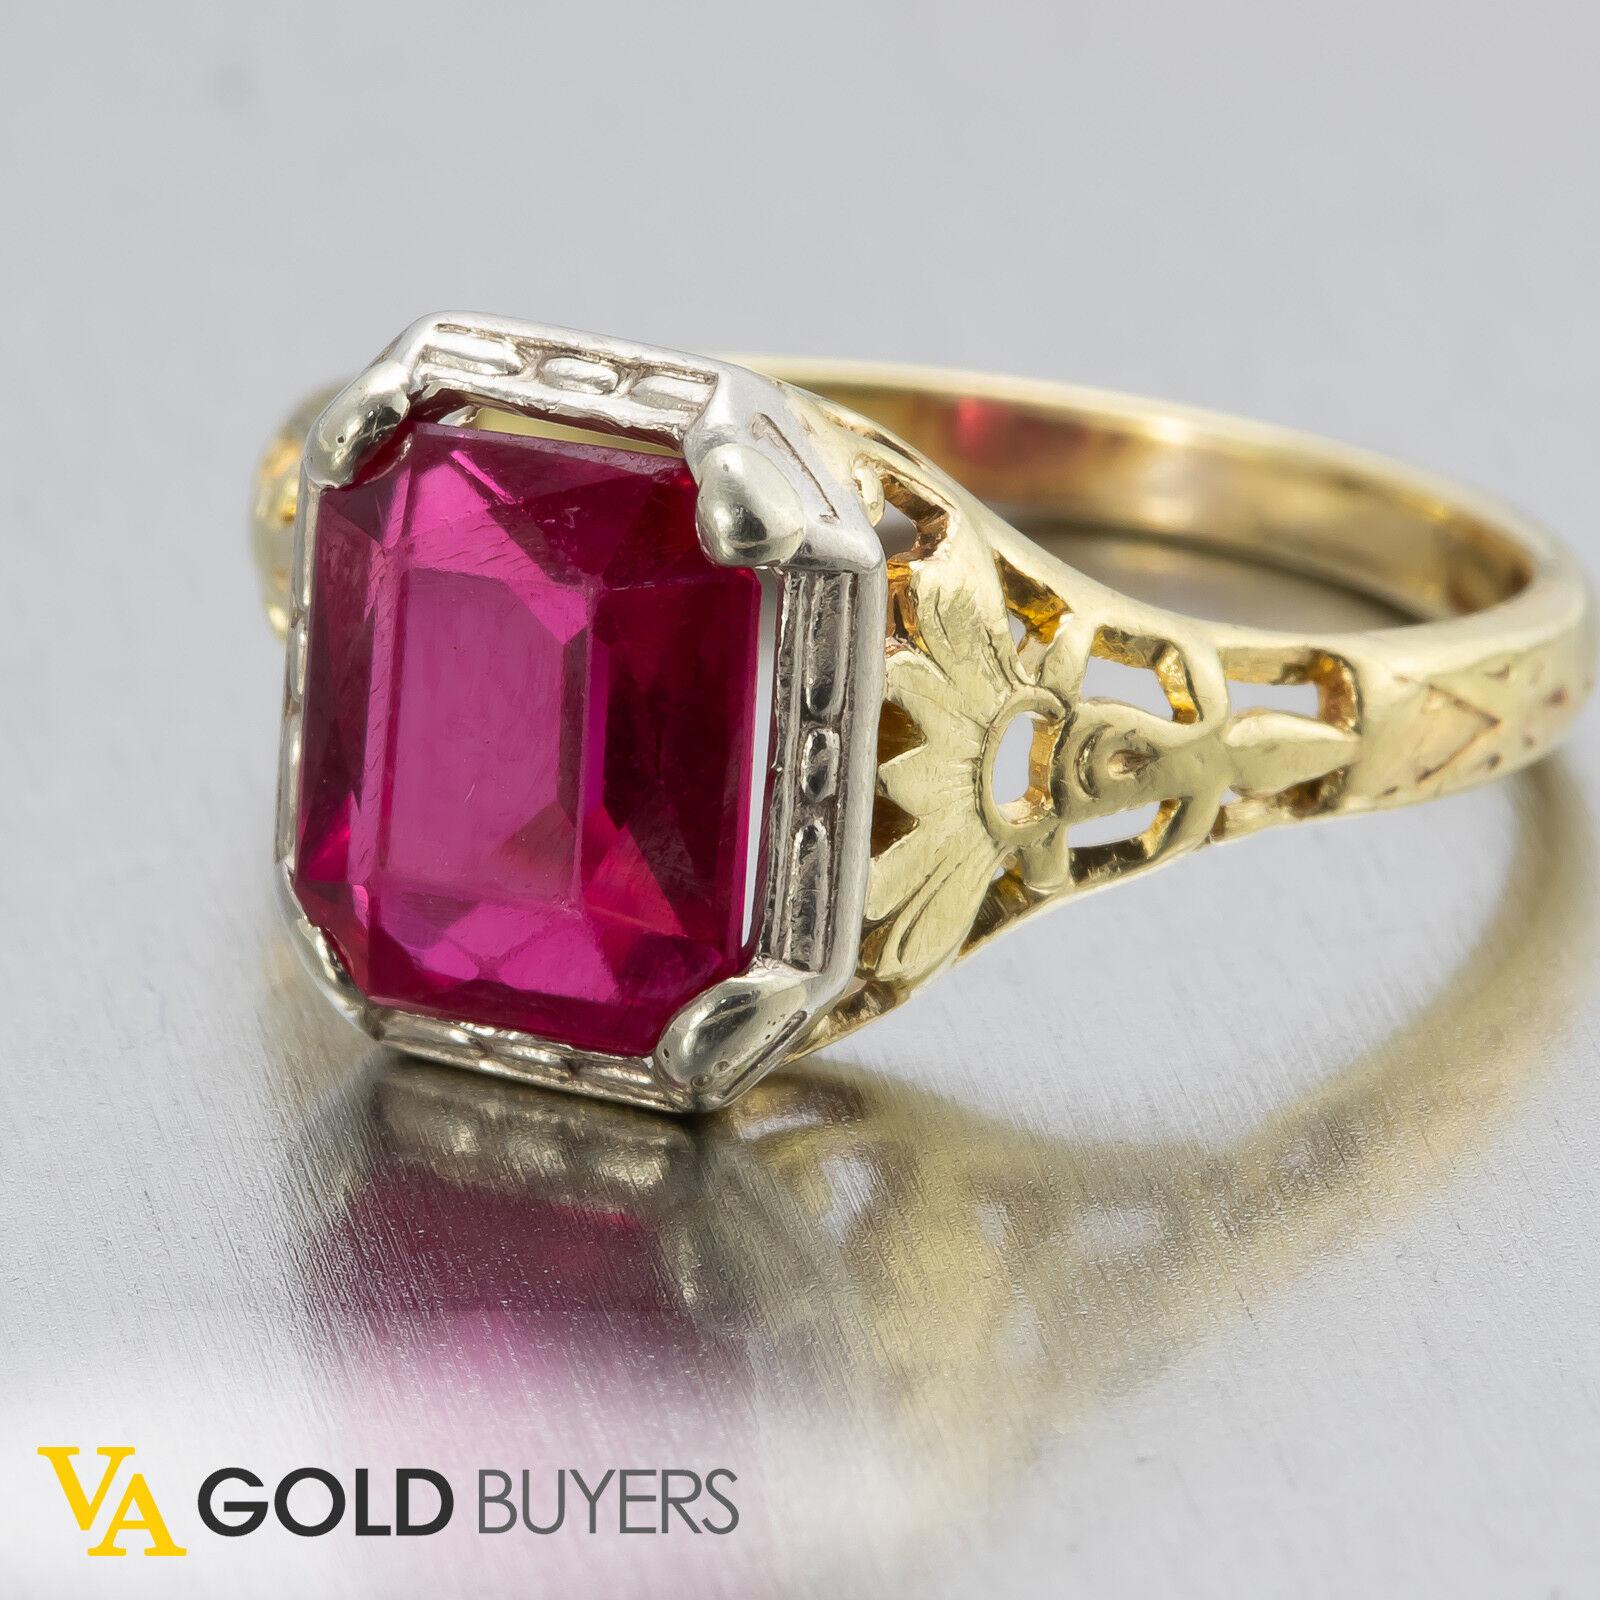 1910s Vintage Estate Edwardian 14k Filigree Created Ruby Ring FREE SHIPPING